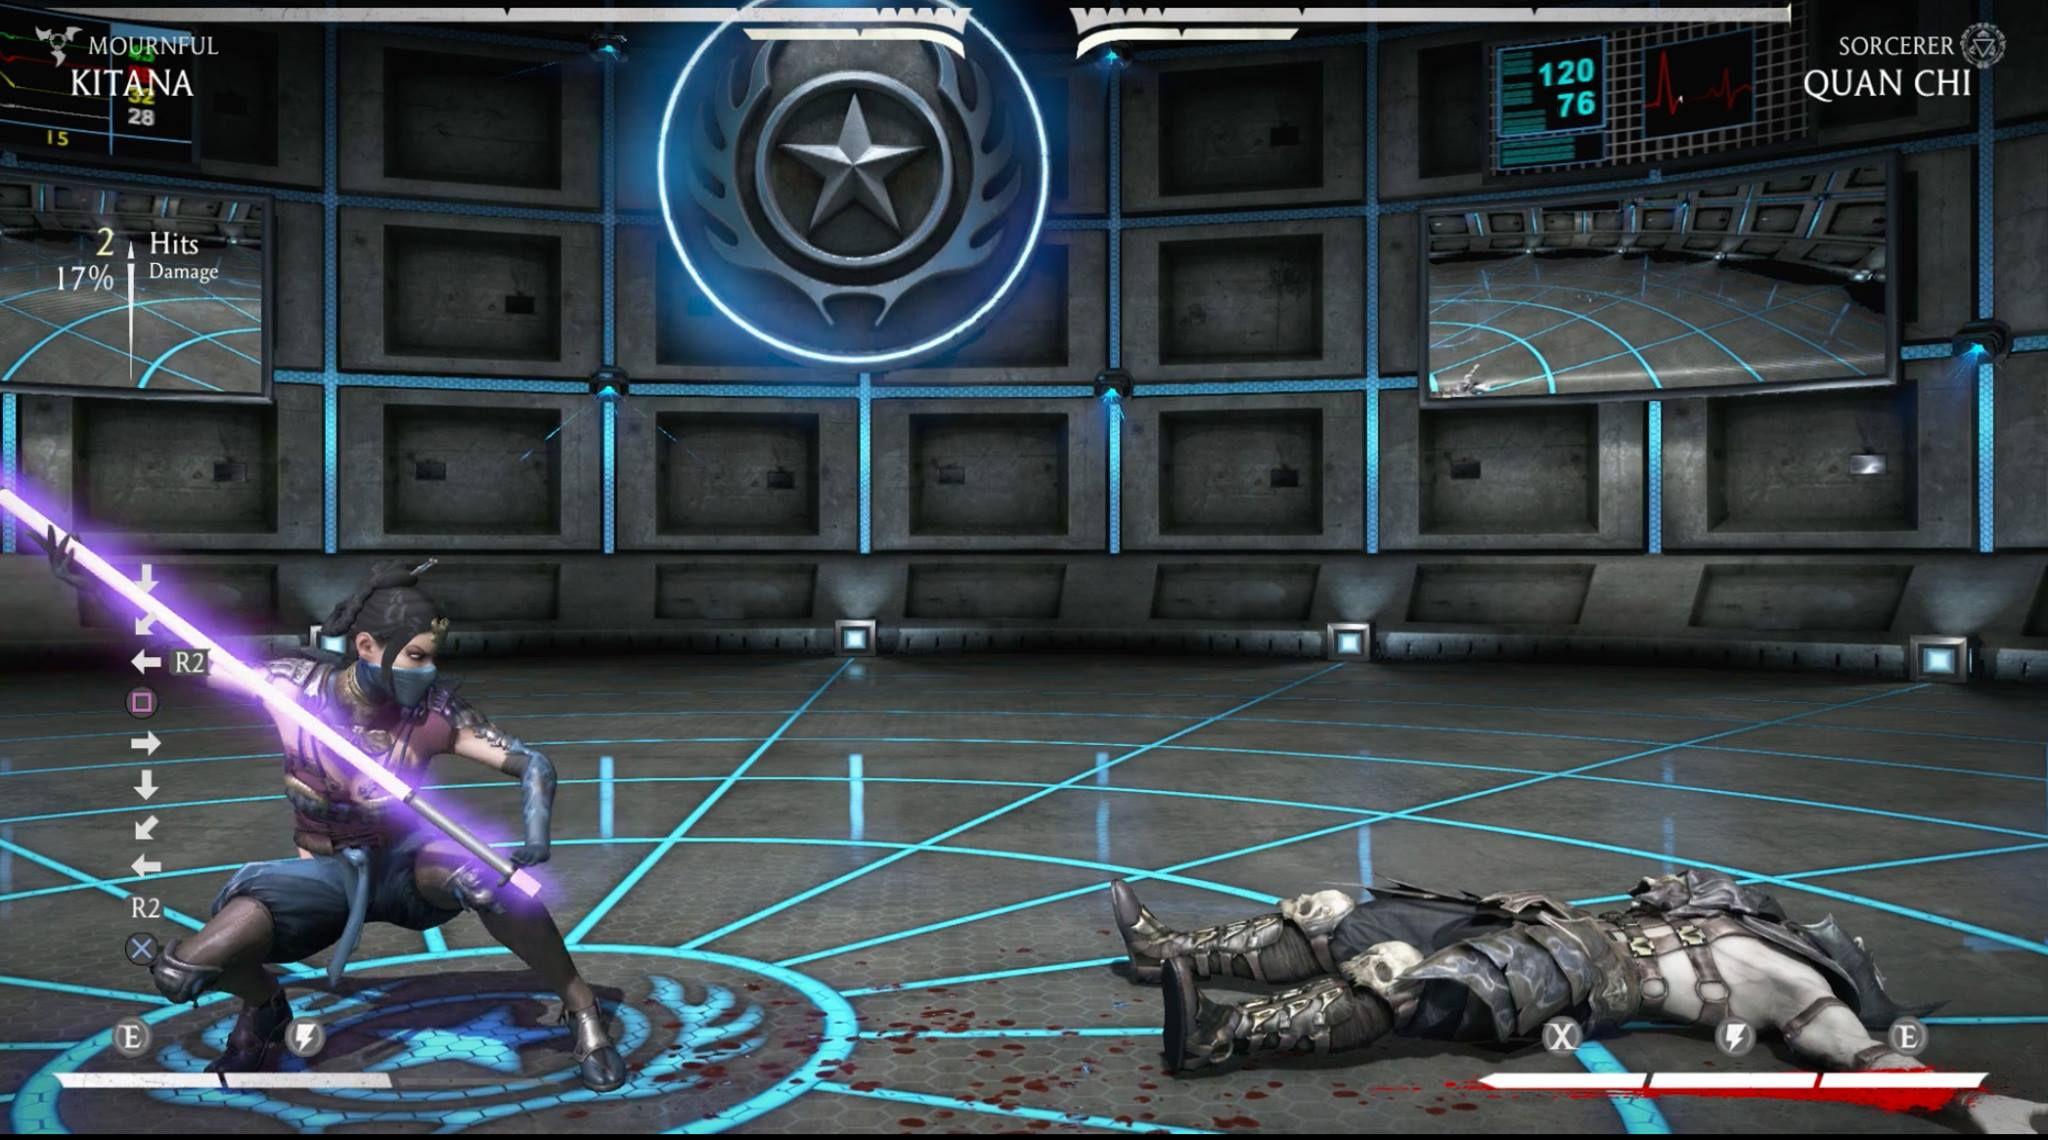 Play Free Minion Games Online - QiQiGames.Com